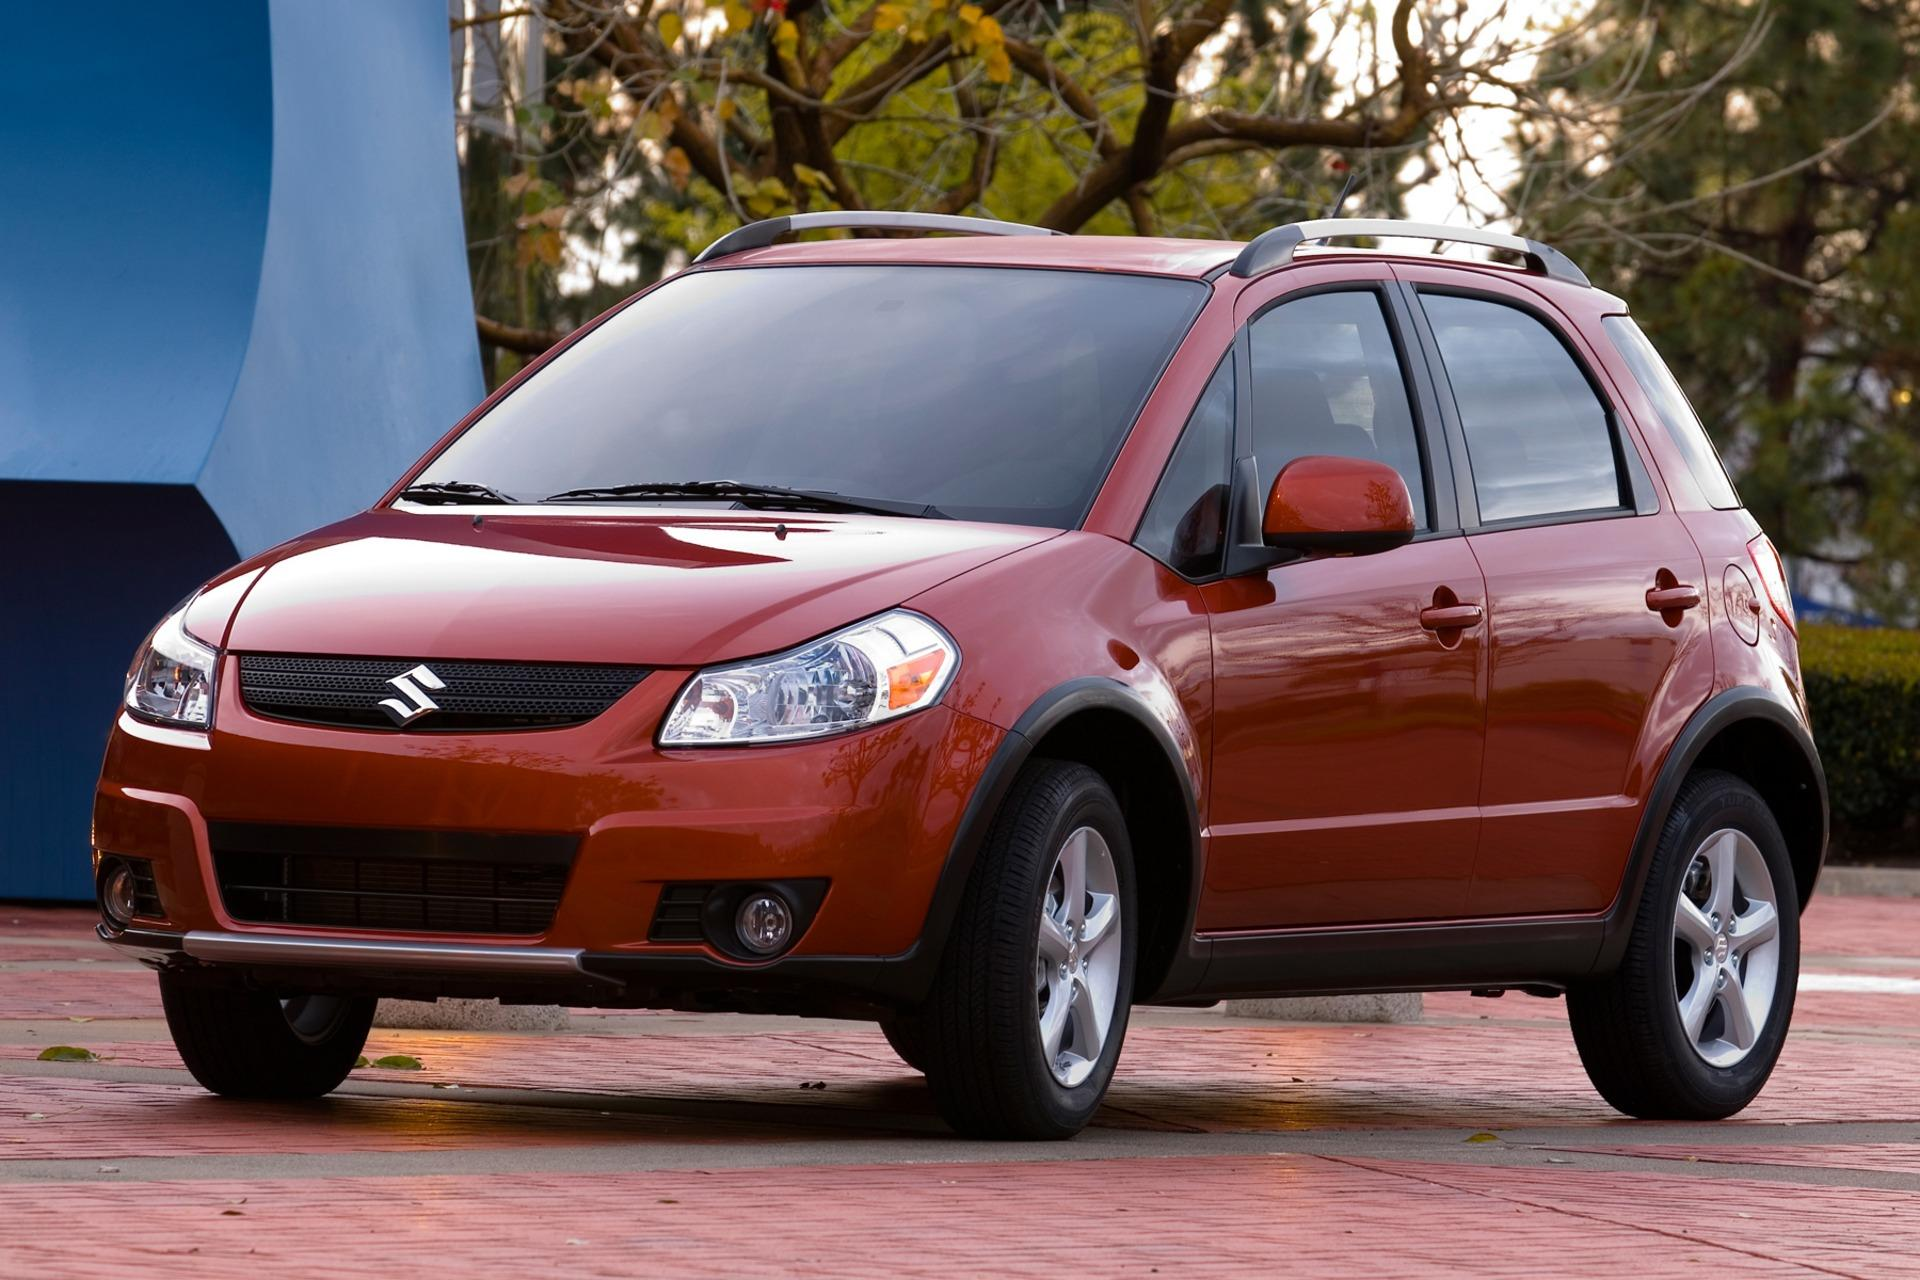 2009 Suzuki Sx4 News And Information Conceptcarz Com